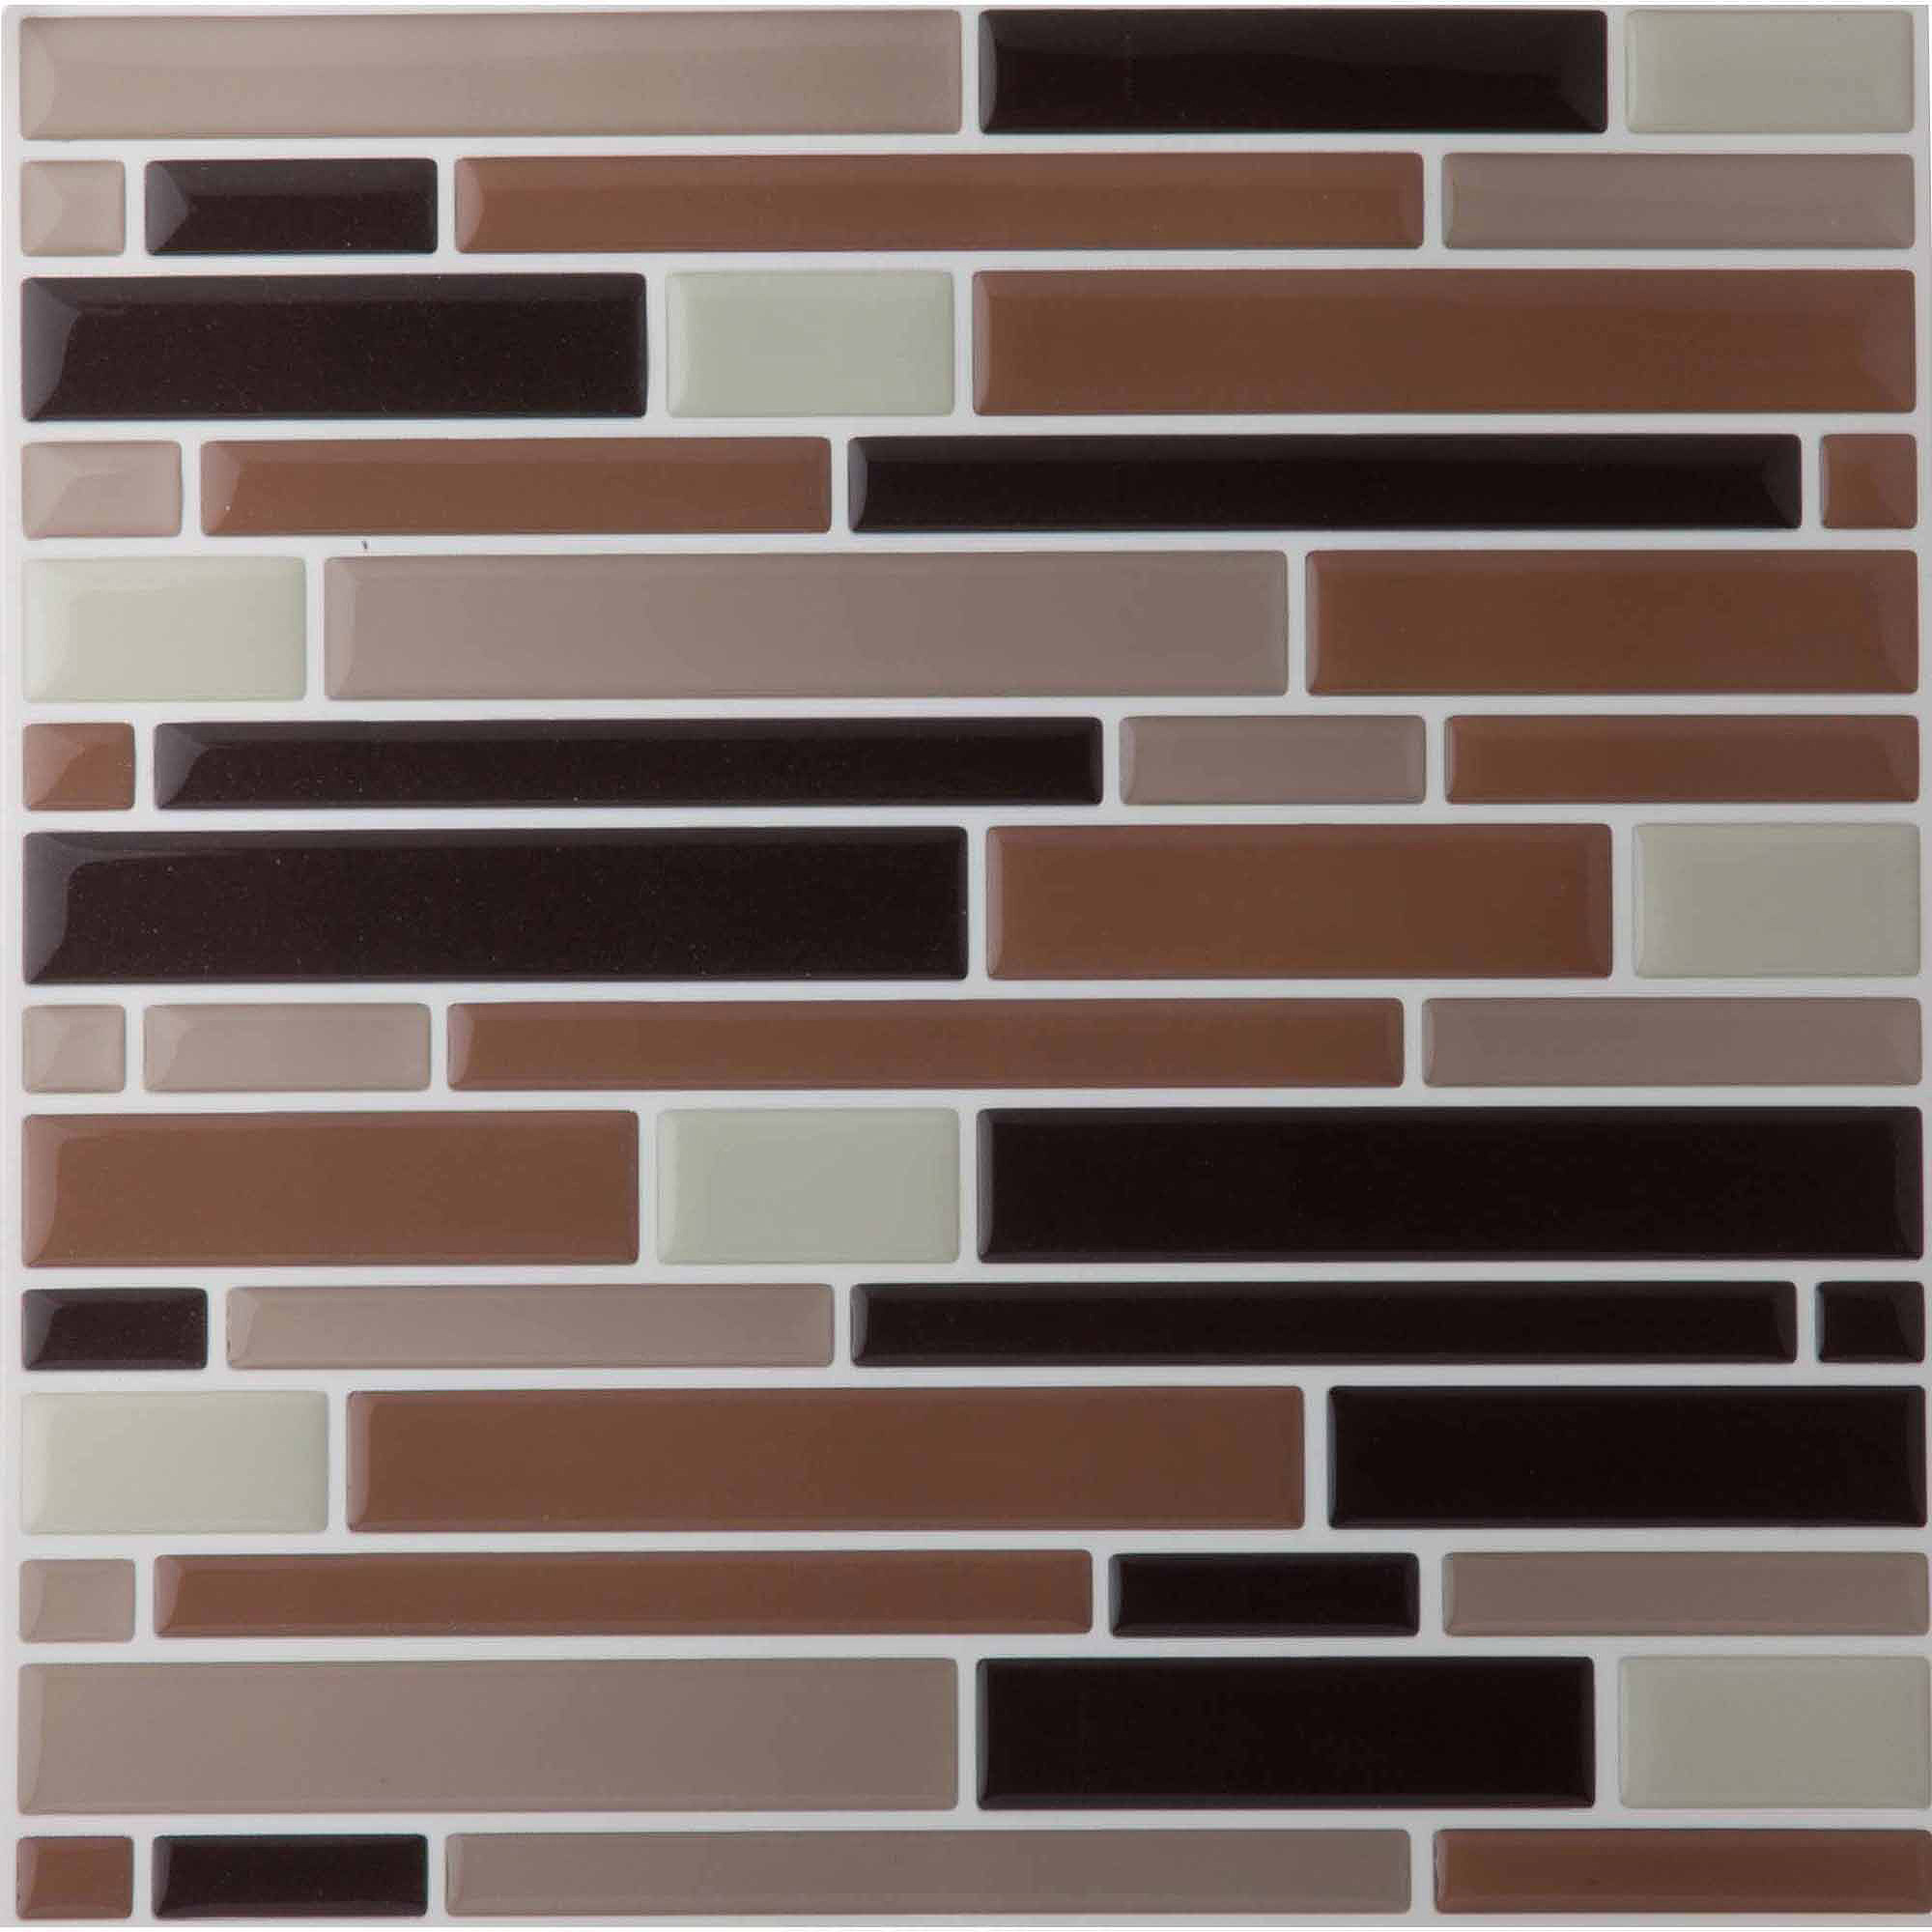 Magic Gel Beige 9.125x9.125 Self Adhesive Vinyl Wall Tile - 1 Tile/0.75 sq Ft.